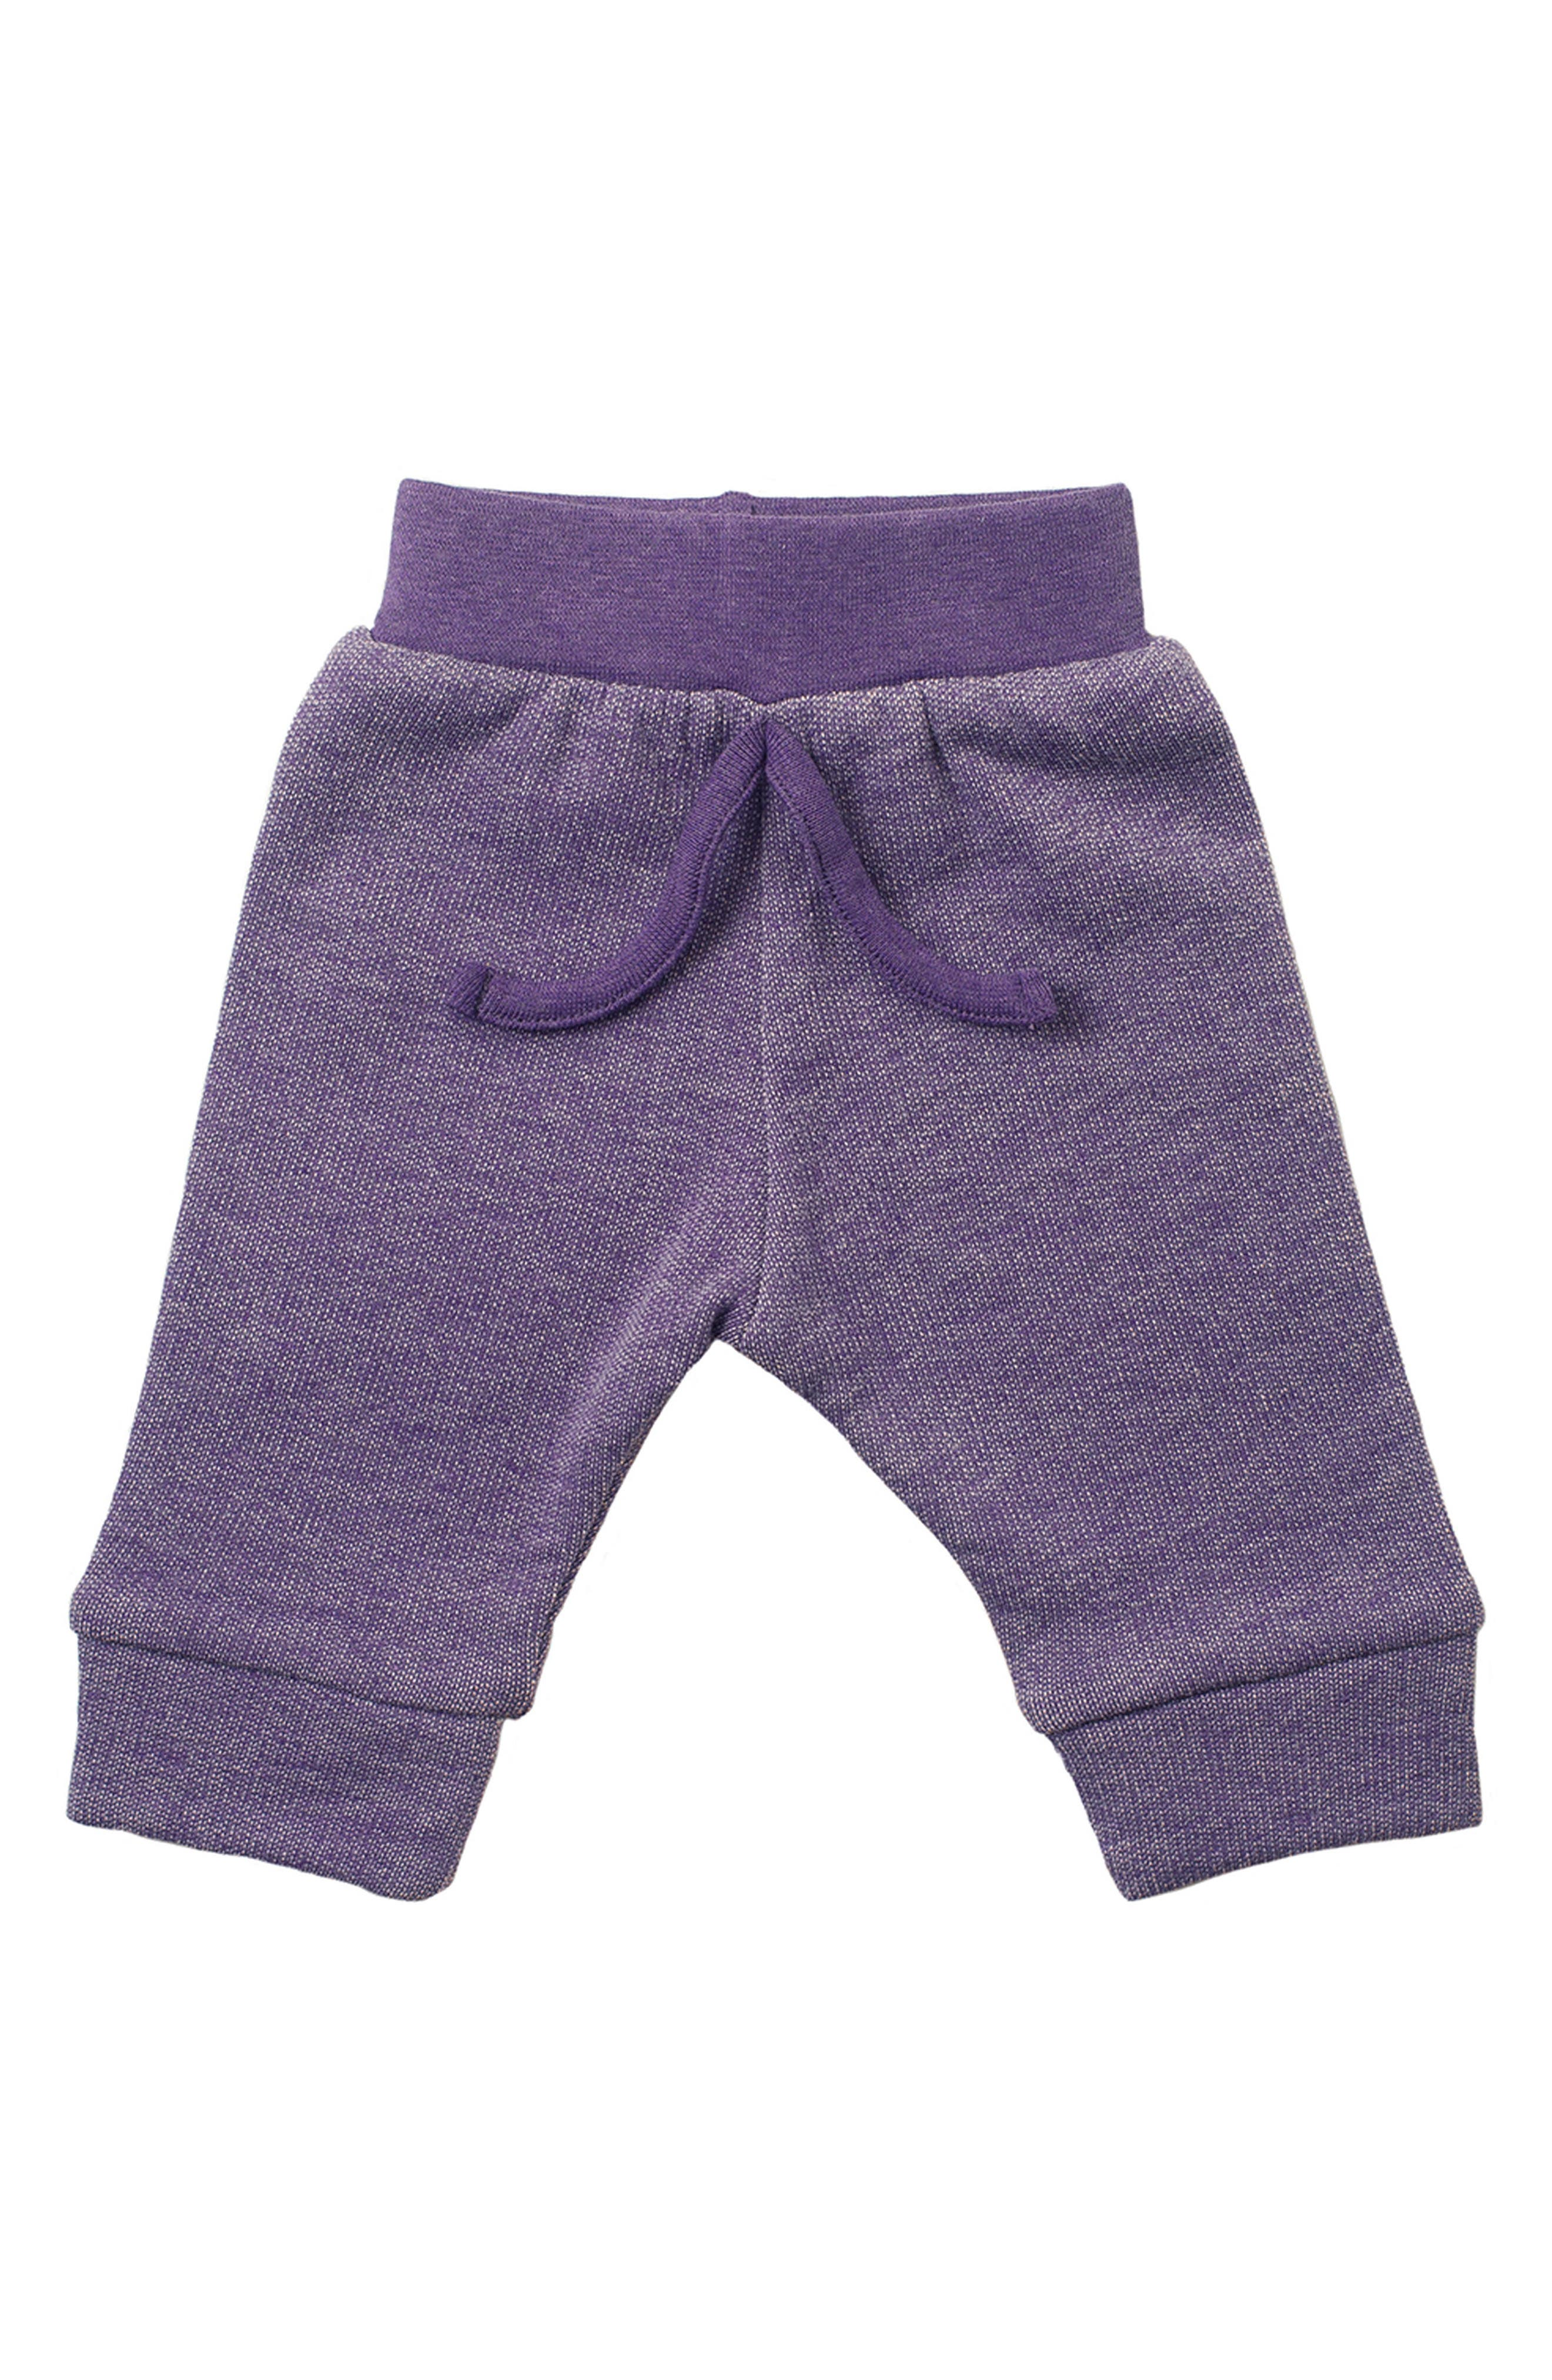 Organic Cotton Sweatpants,                             Main thumbnail 1, color,                             Dark Purple Heather